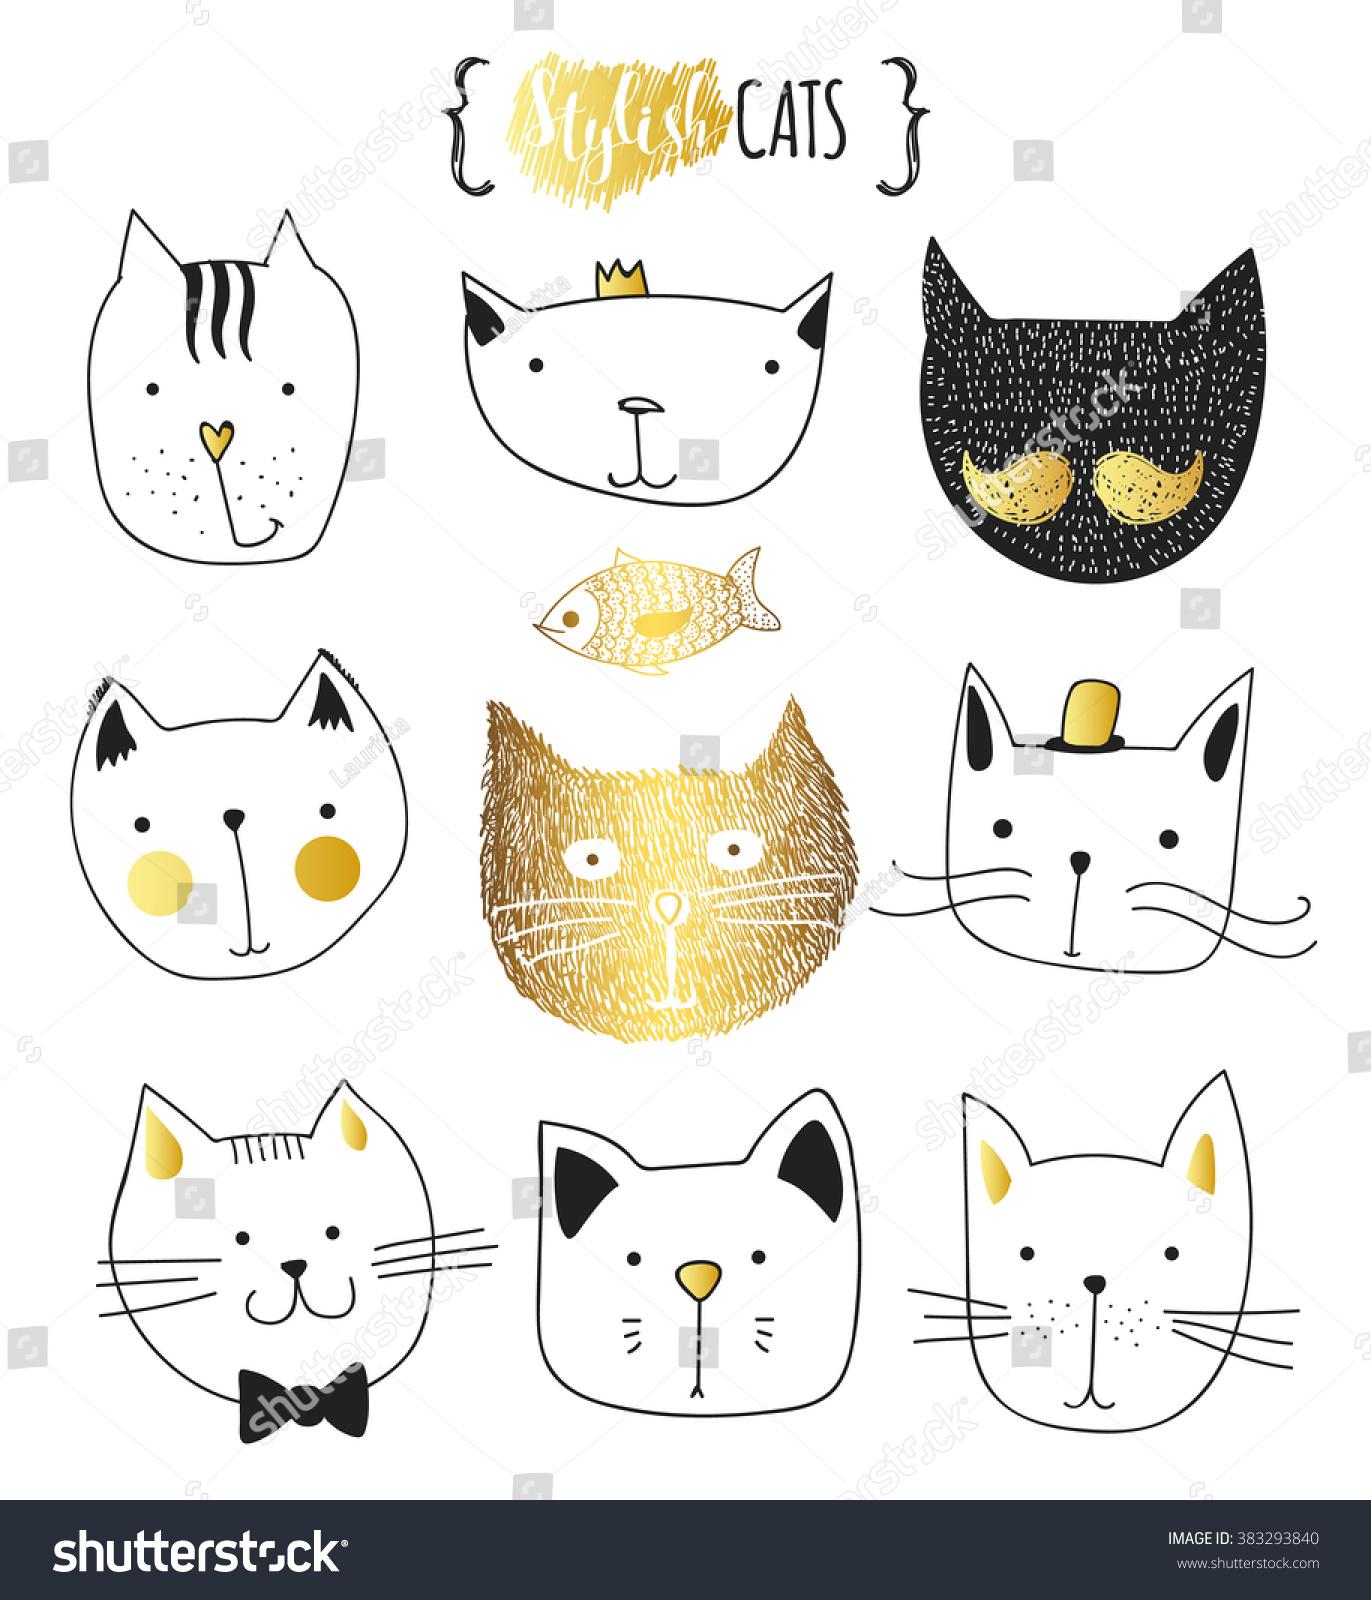 cats set cute doodle sketch character stock vector 383293840